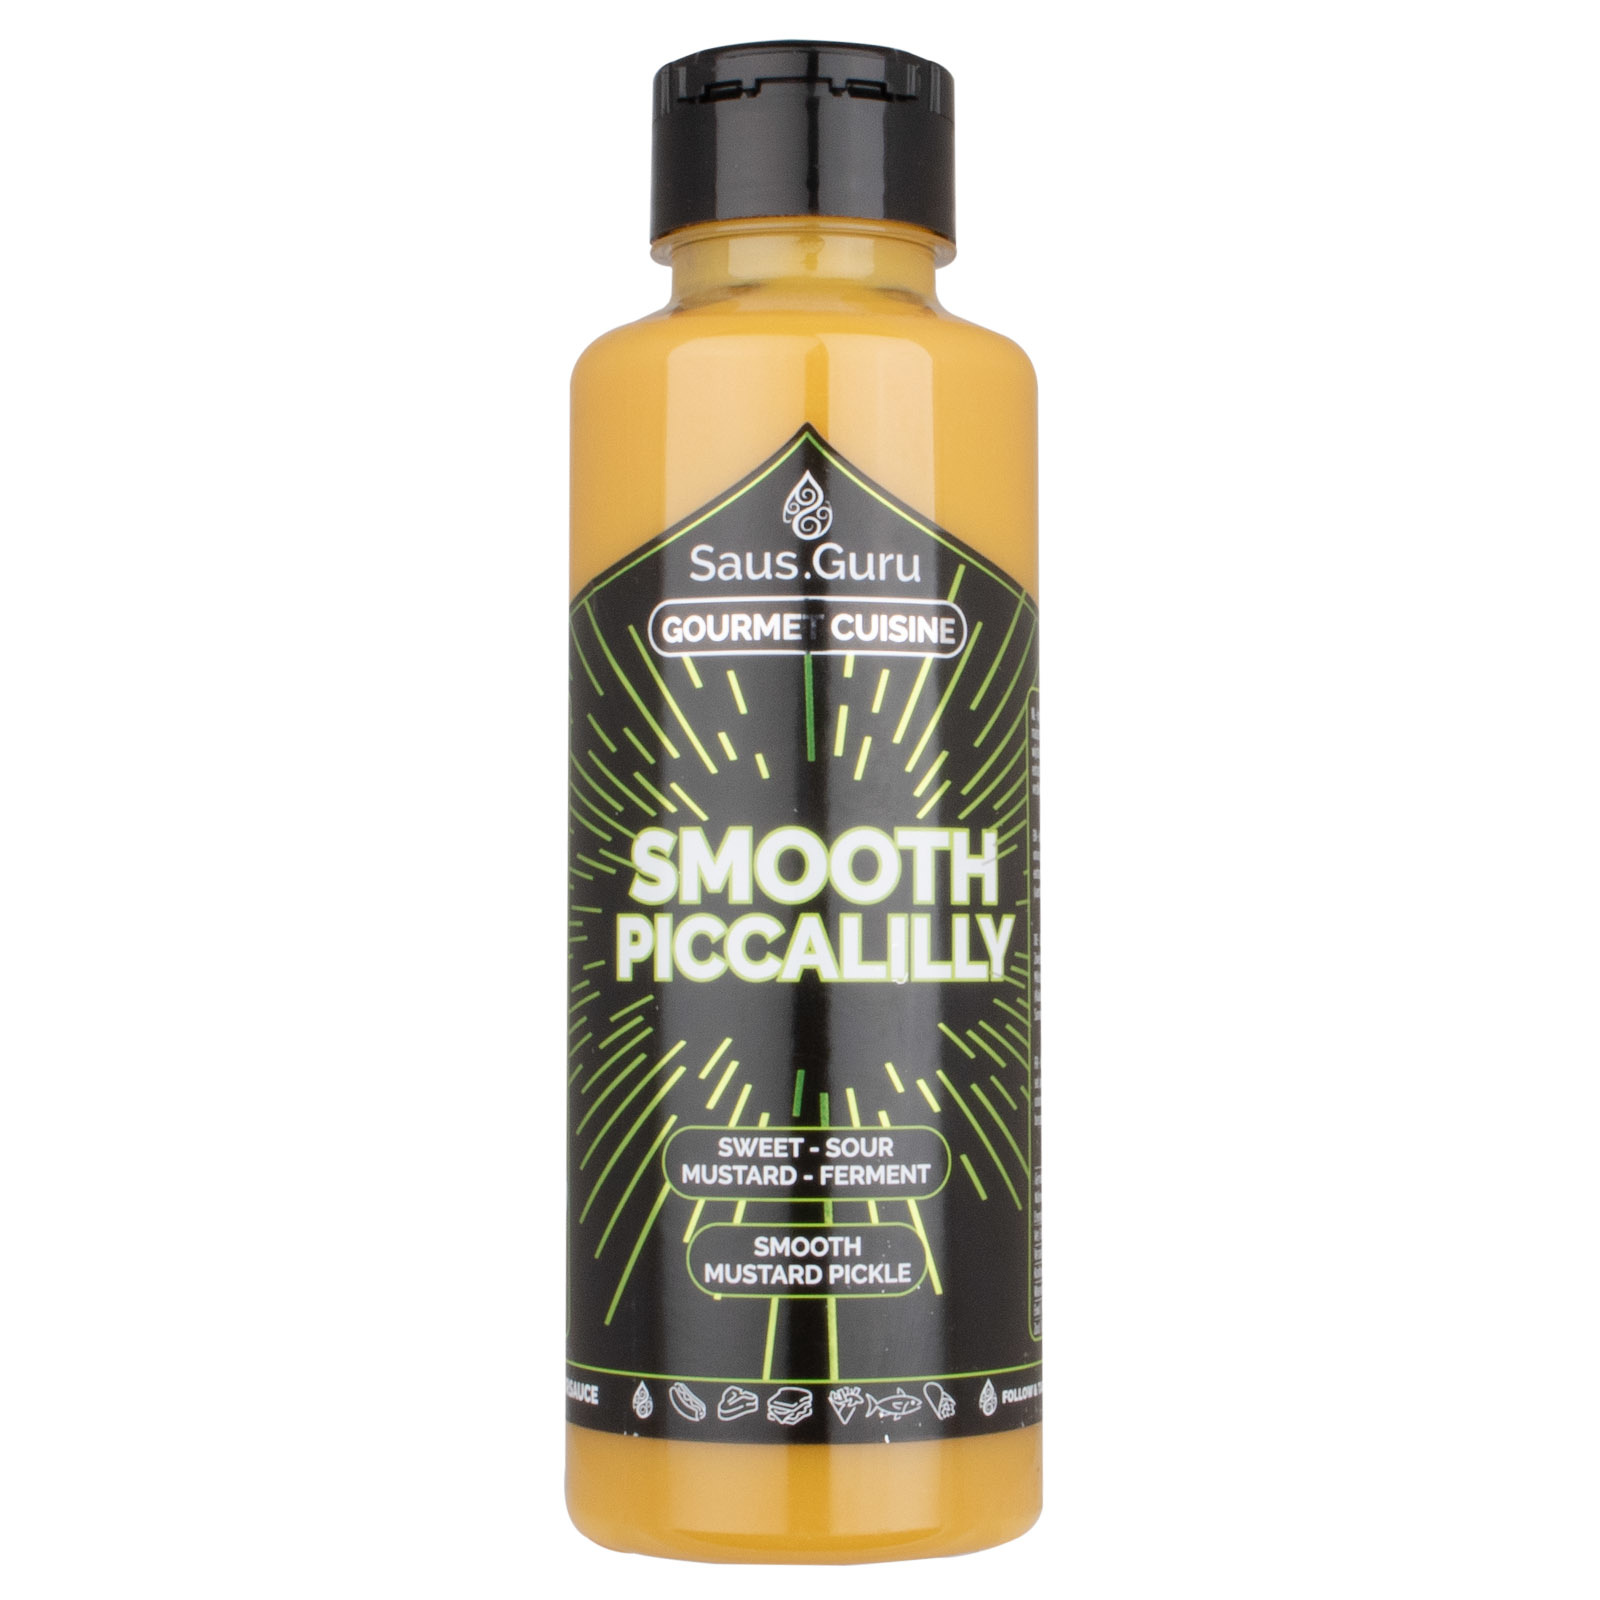 Saus.Guru's Smooth Piccalilly-2